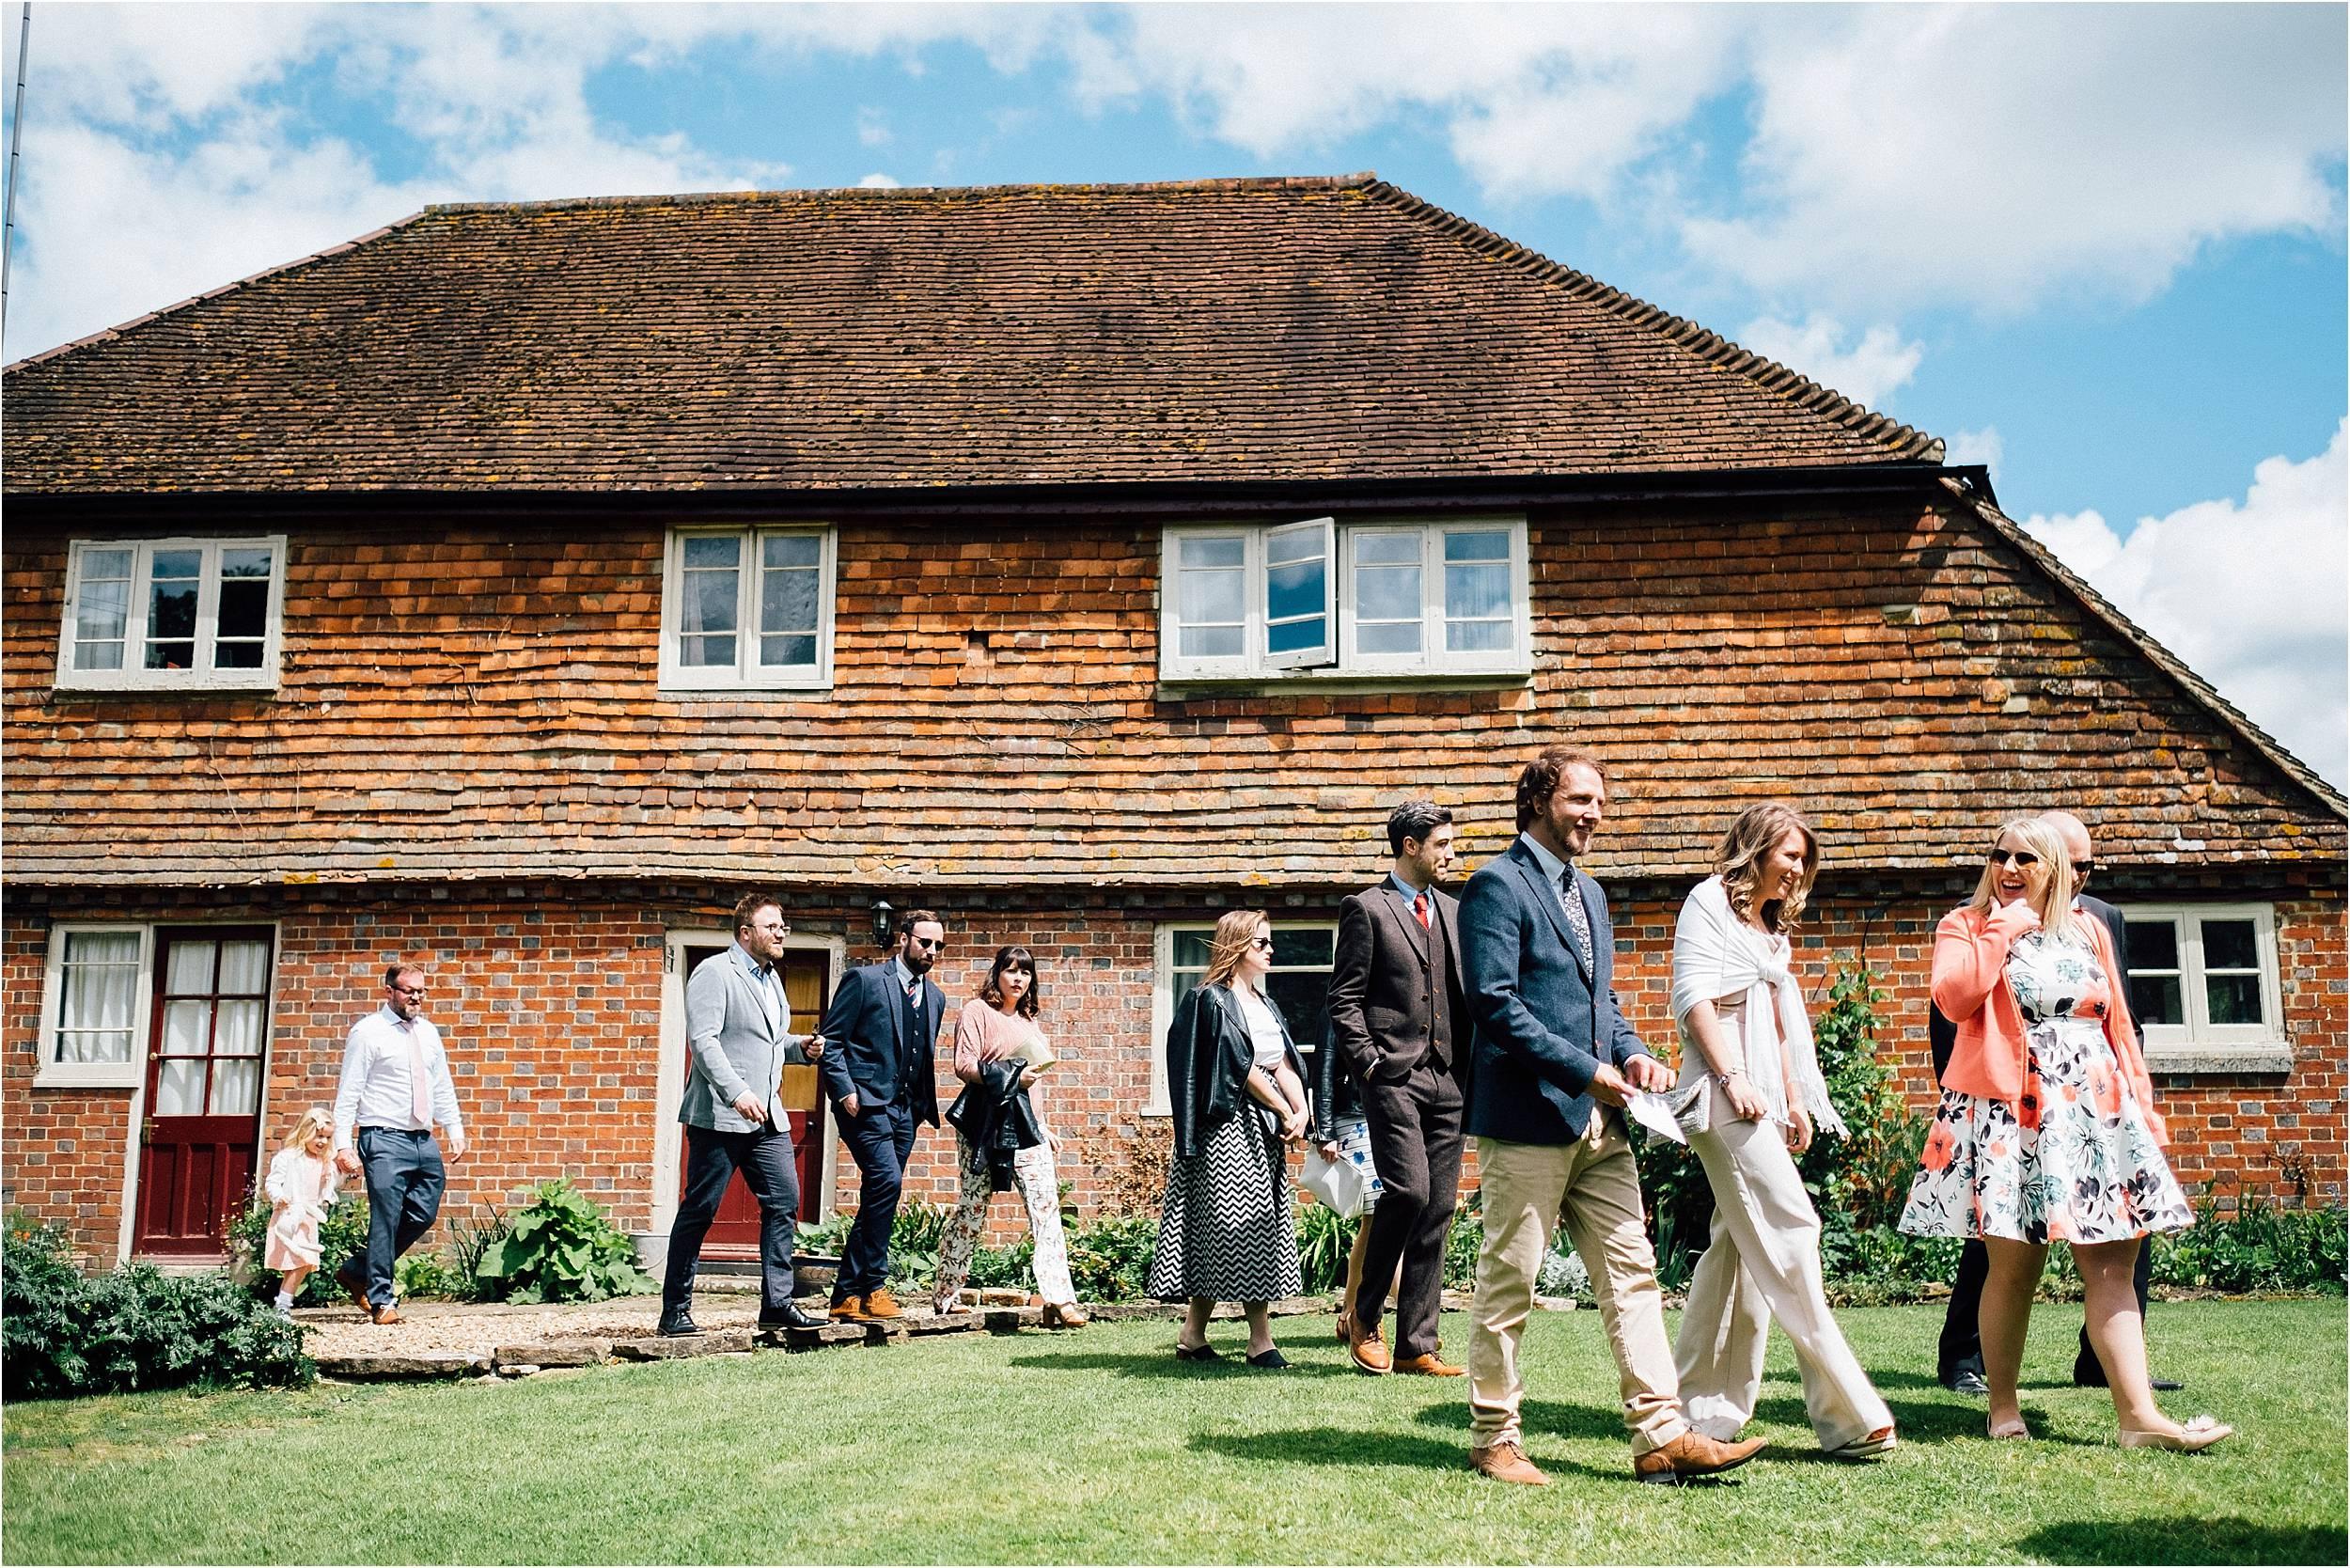 Surrey Hookhouse Farm Wedding Photographer_0025.jpg